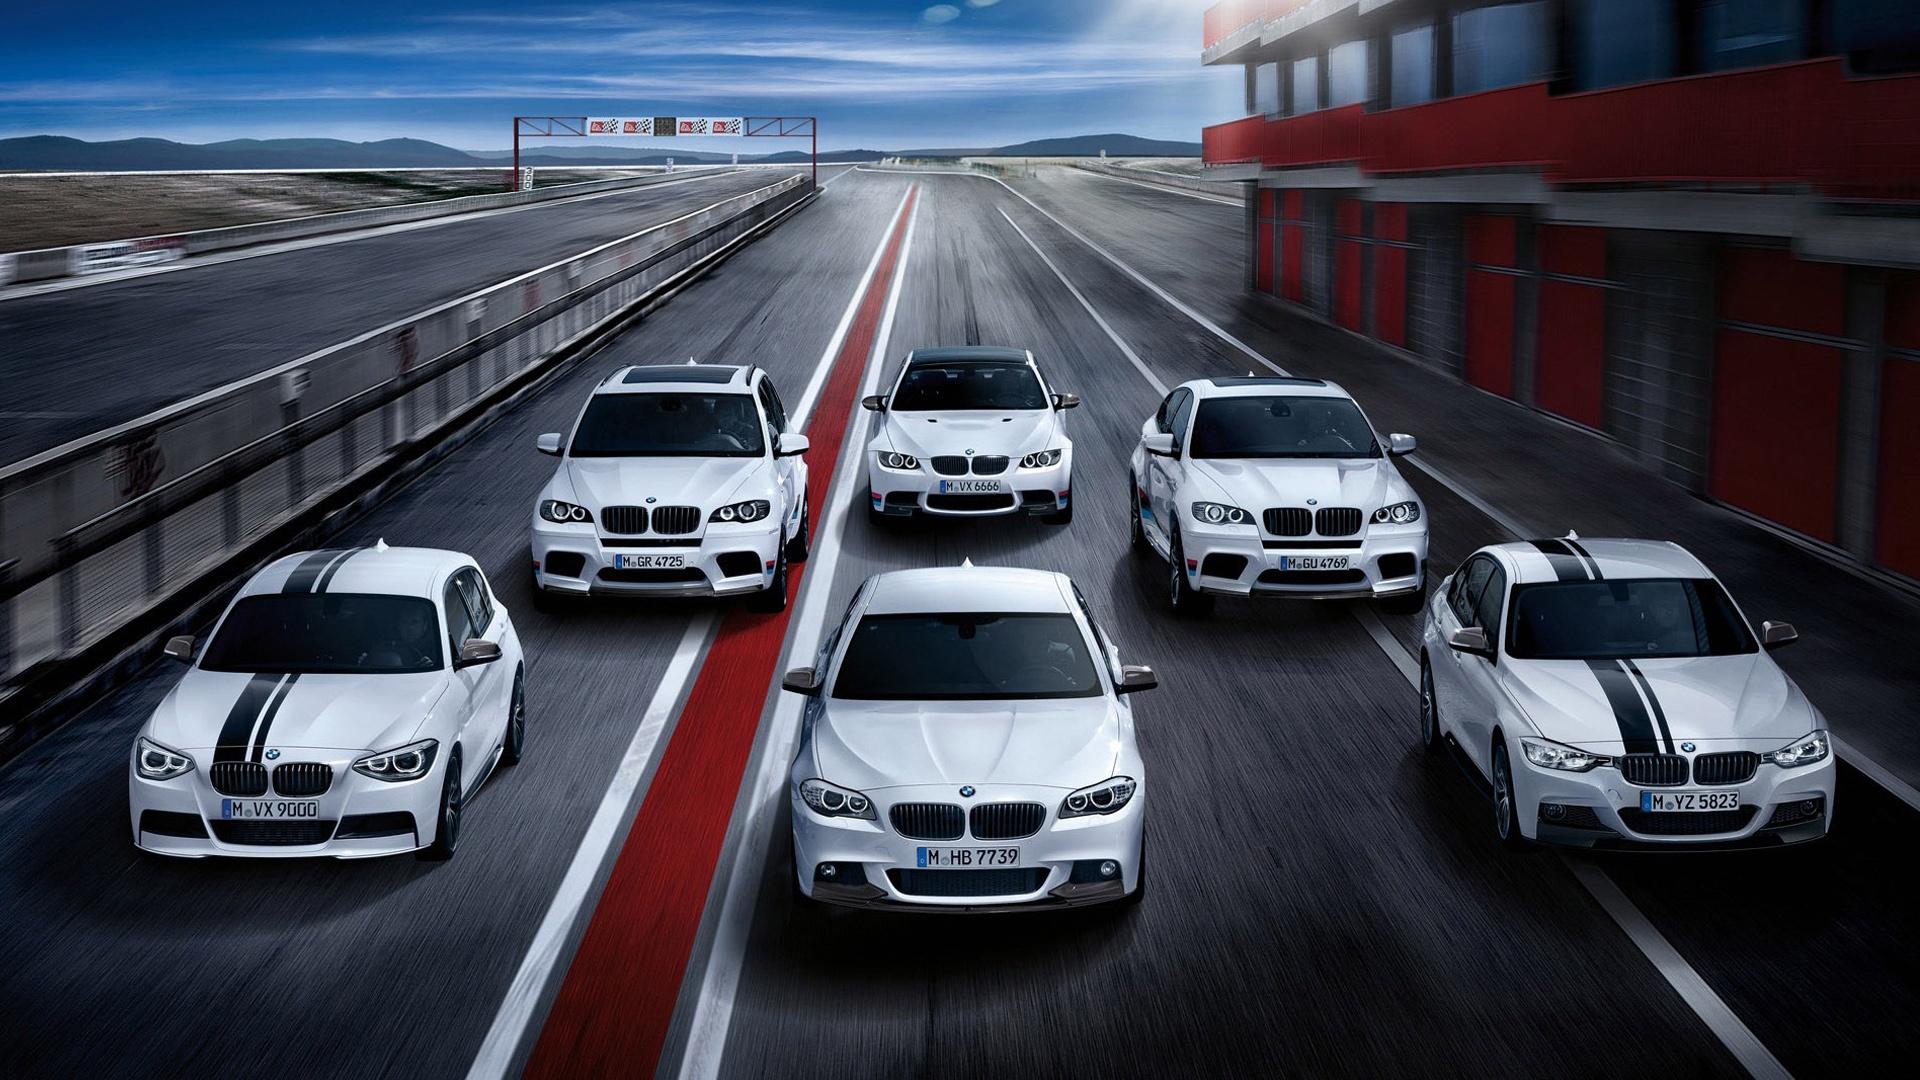 48] BMW M HD Wallpaper on WallpaperSafari 1920x1080